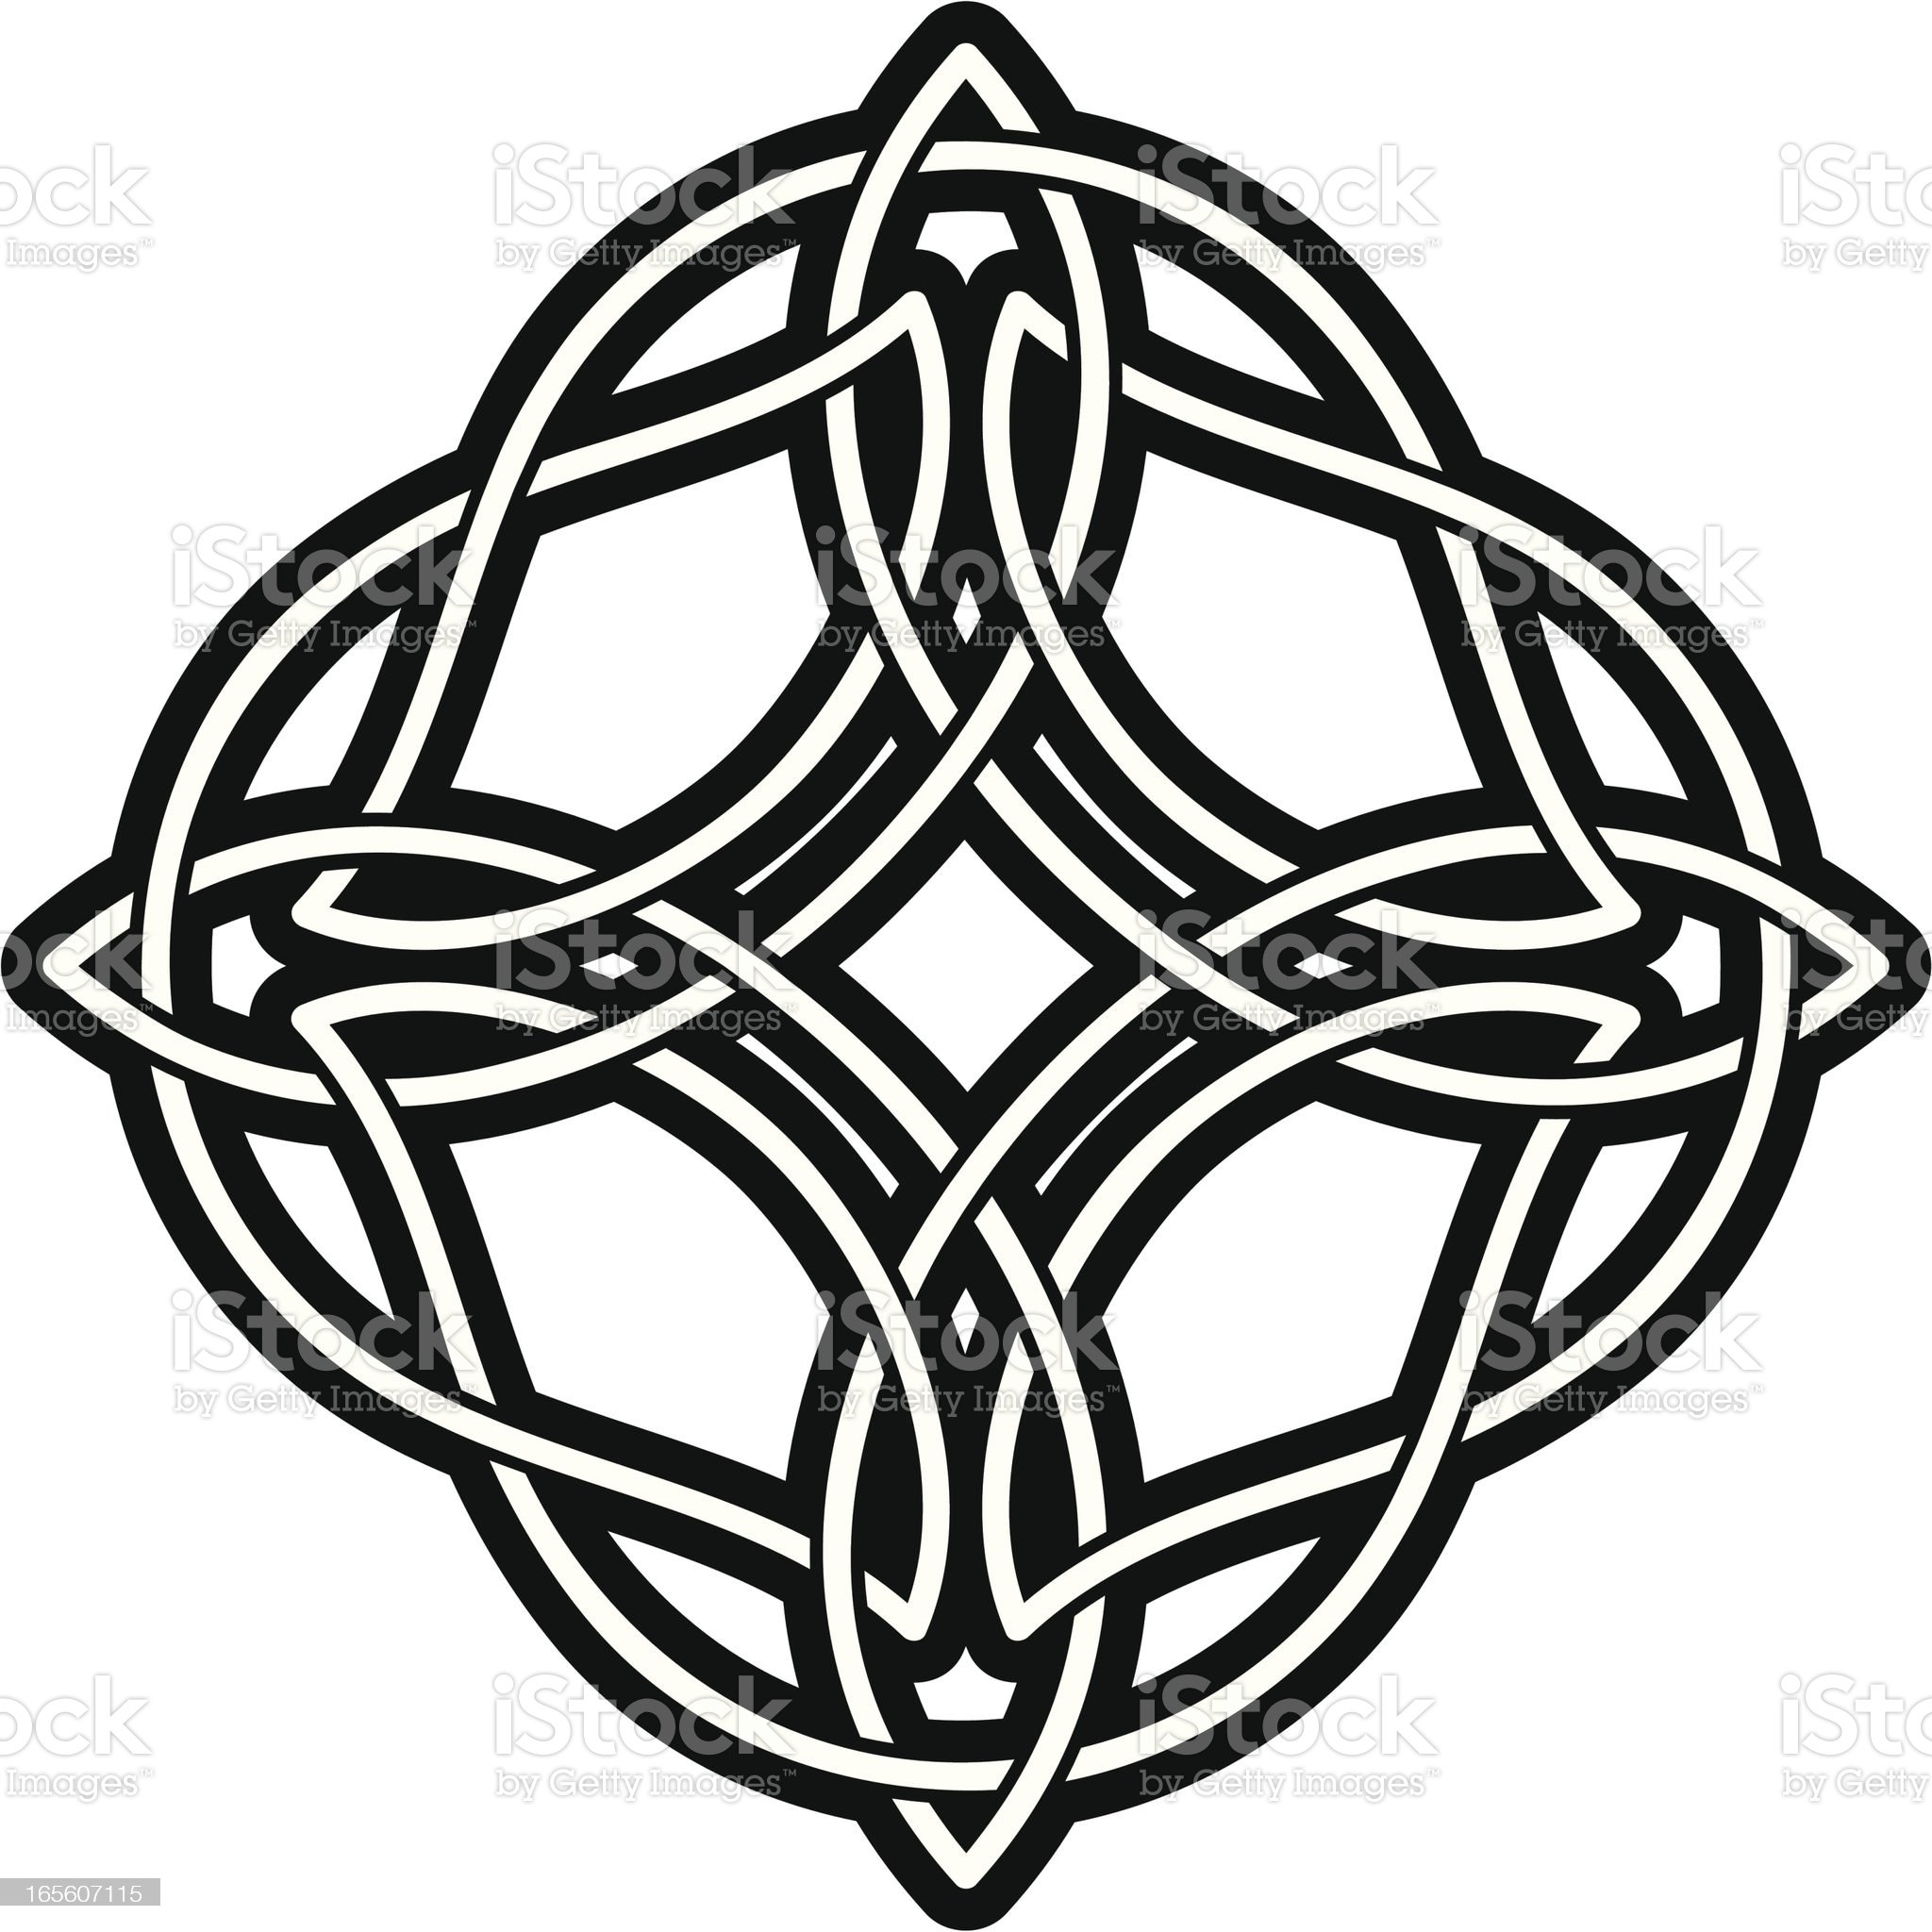 Celtic knot medallion royalty-free stock vector art